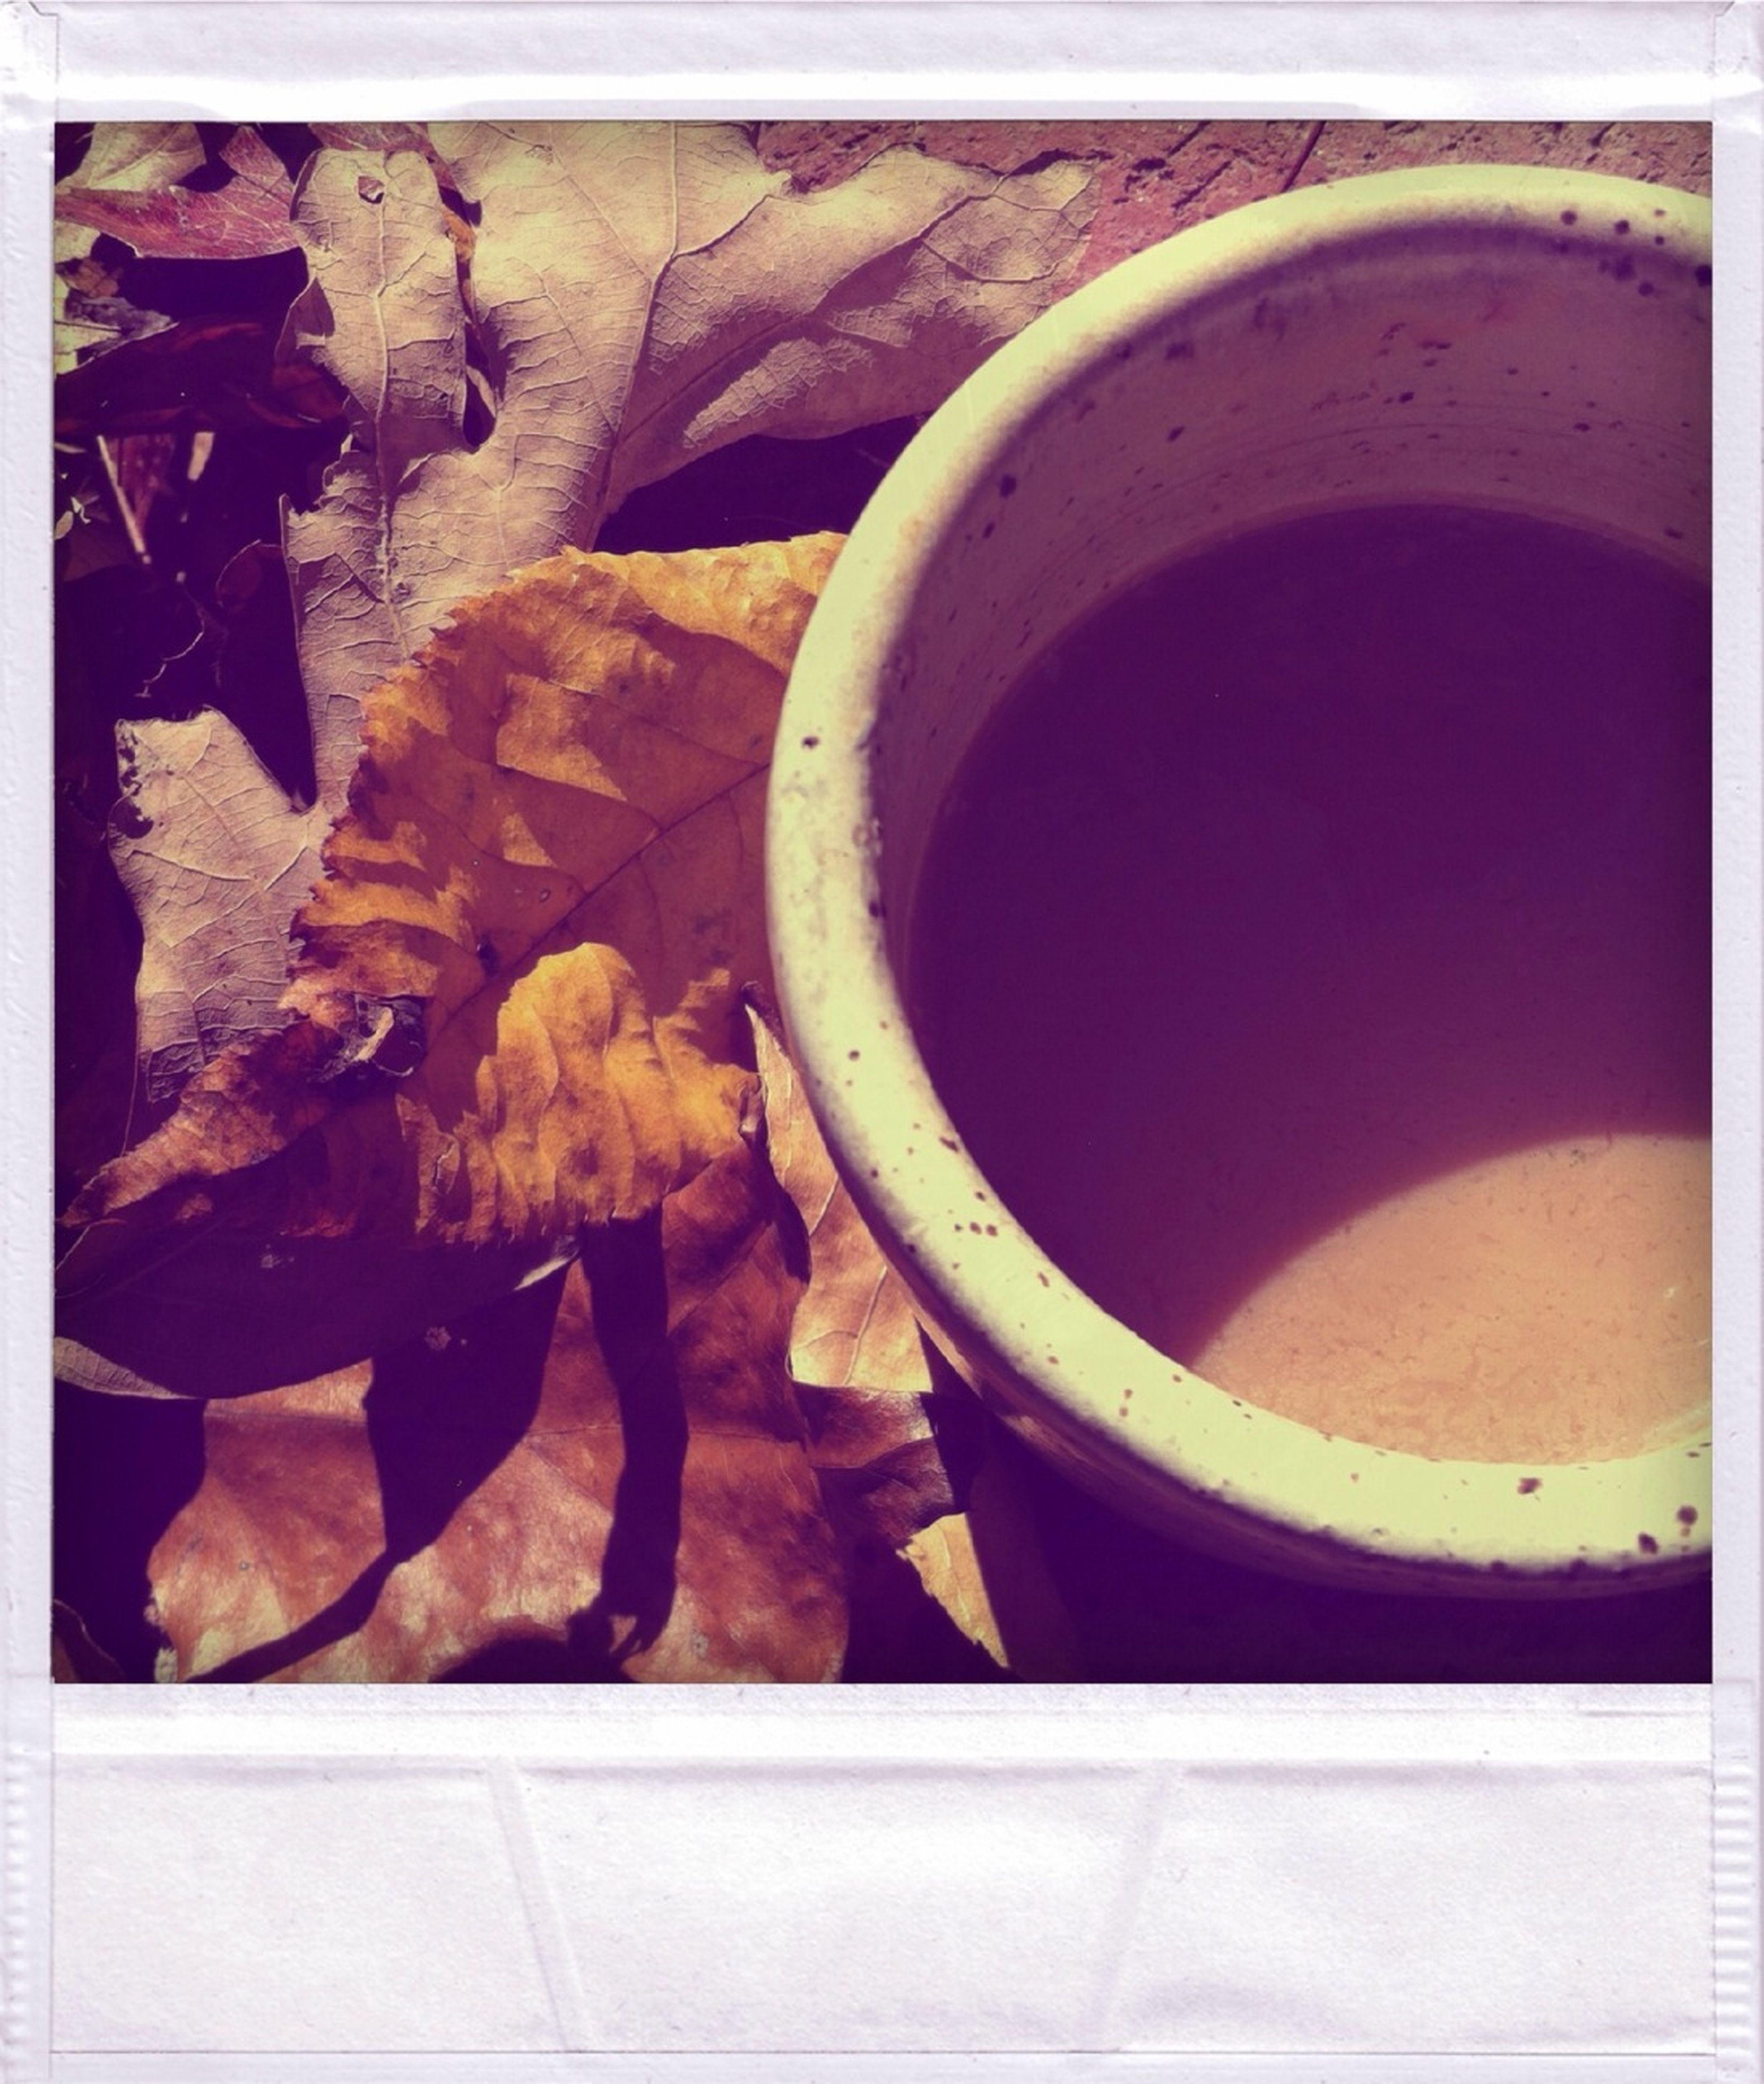 Coffee-drinking